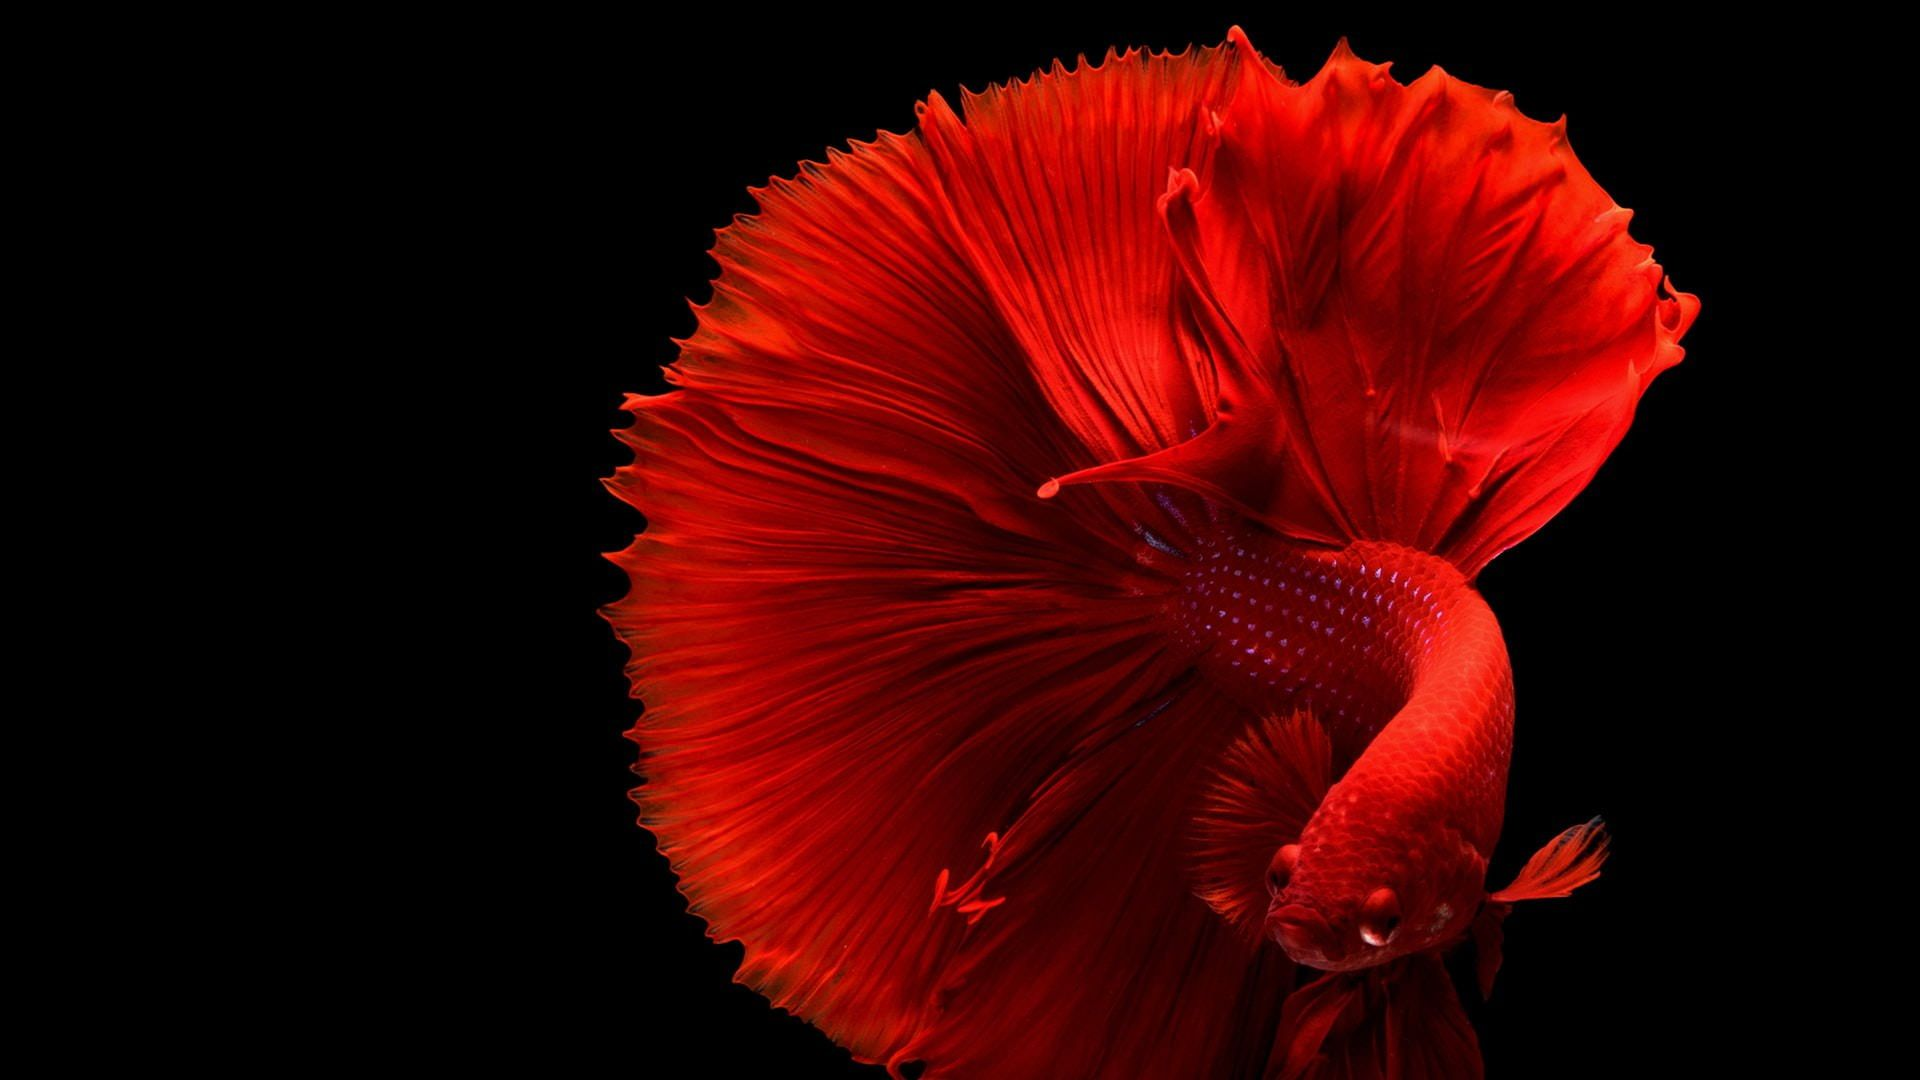 Red Betta Fish 1080p Wallpaper Hdwallpaper Desktop In 2020 Siamese Fighting Fish Betta Fish Care Betta Fish